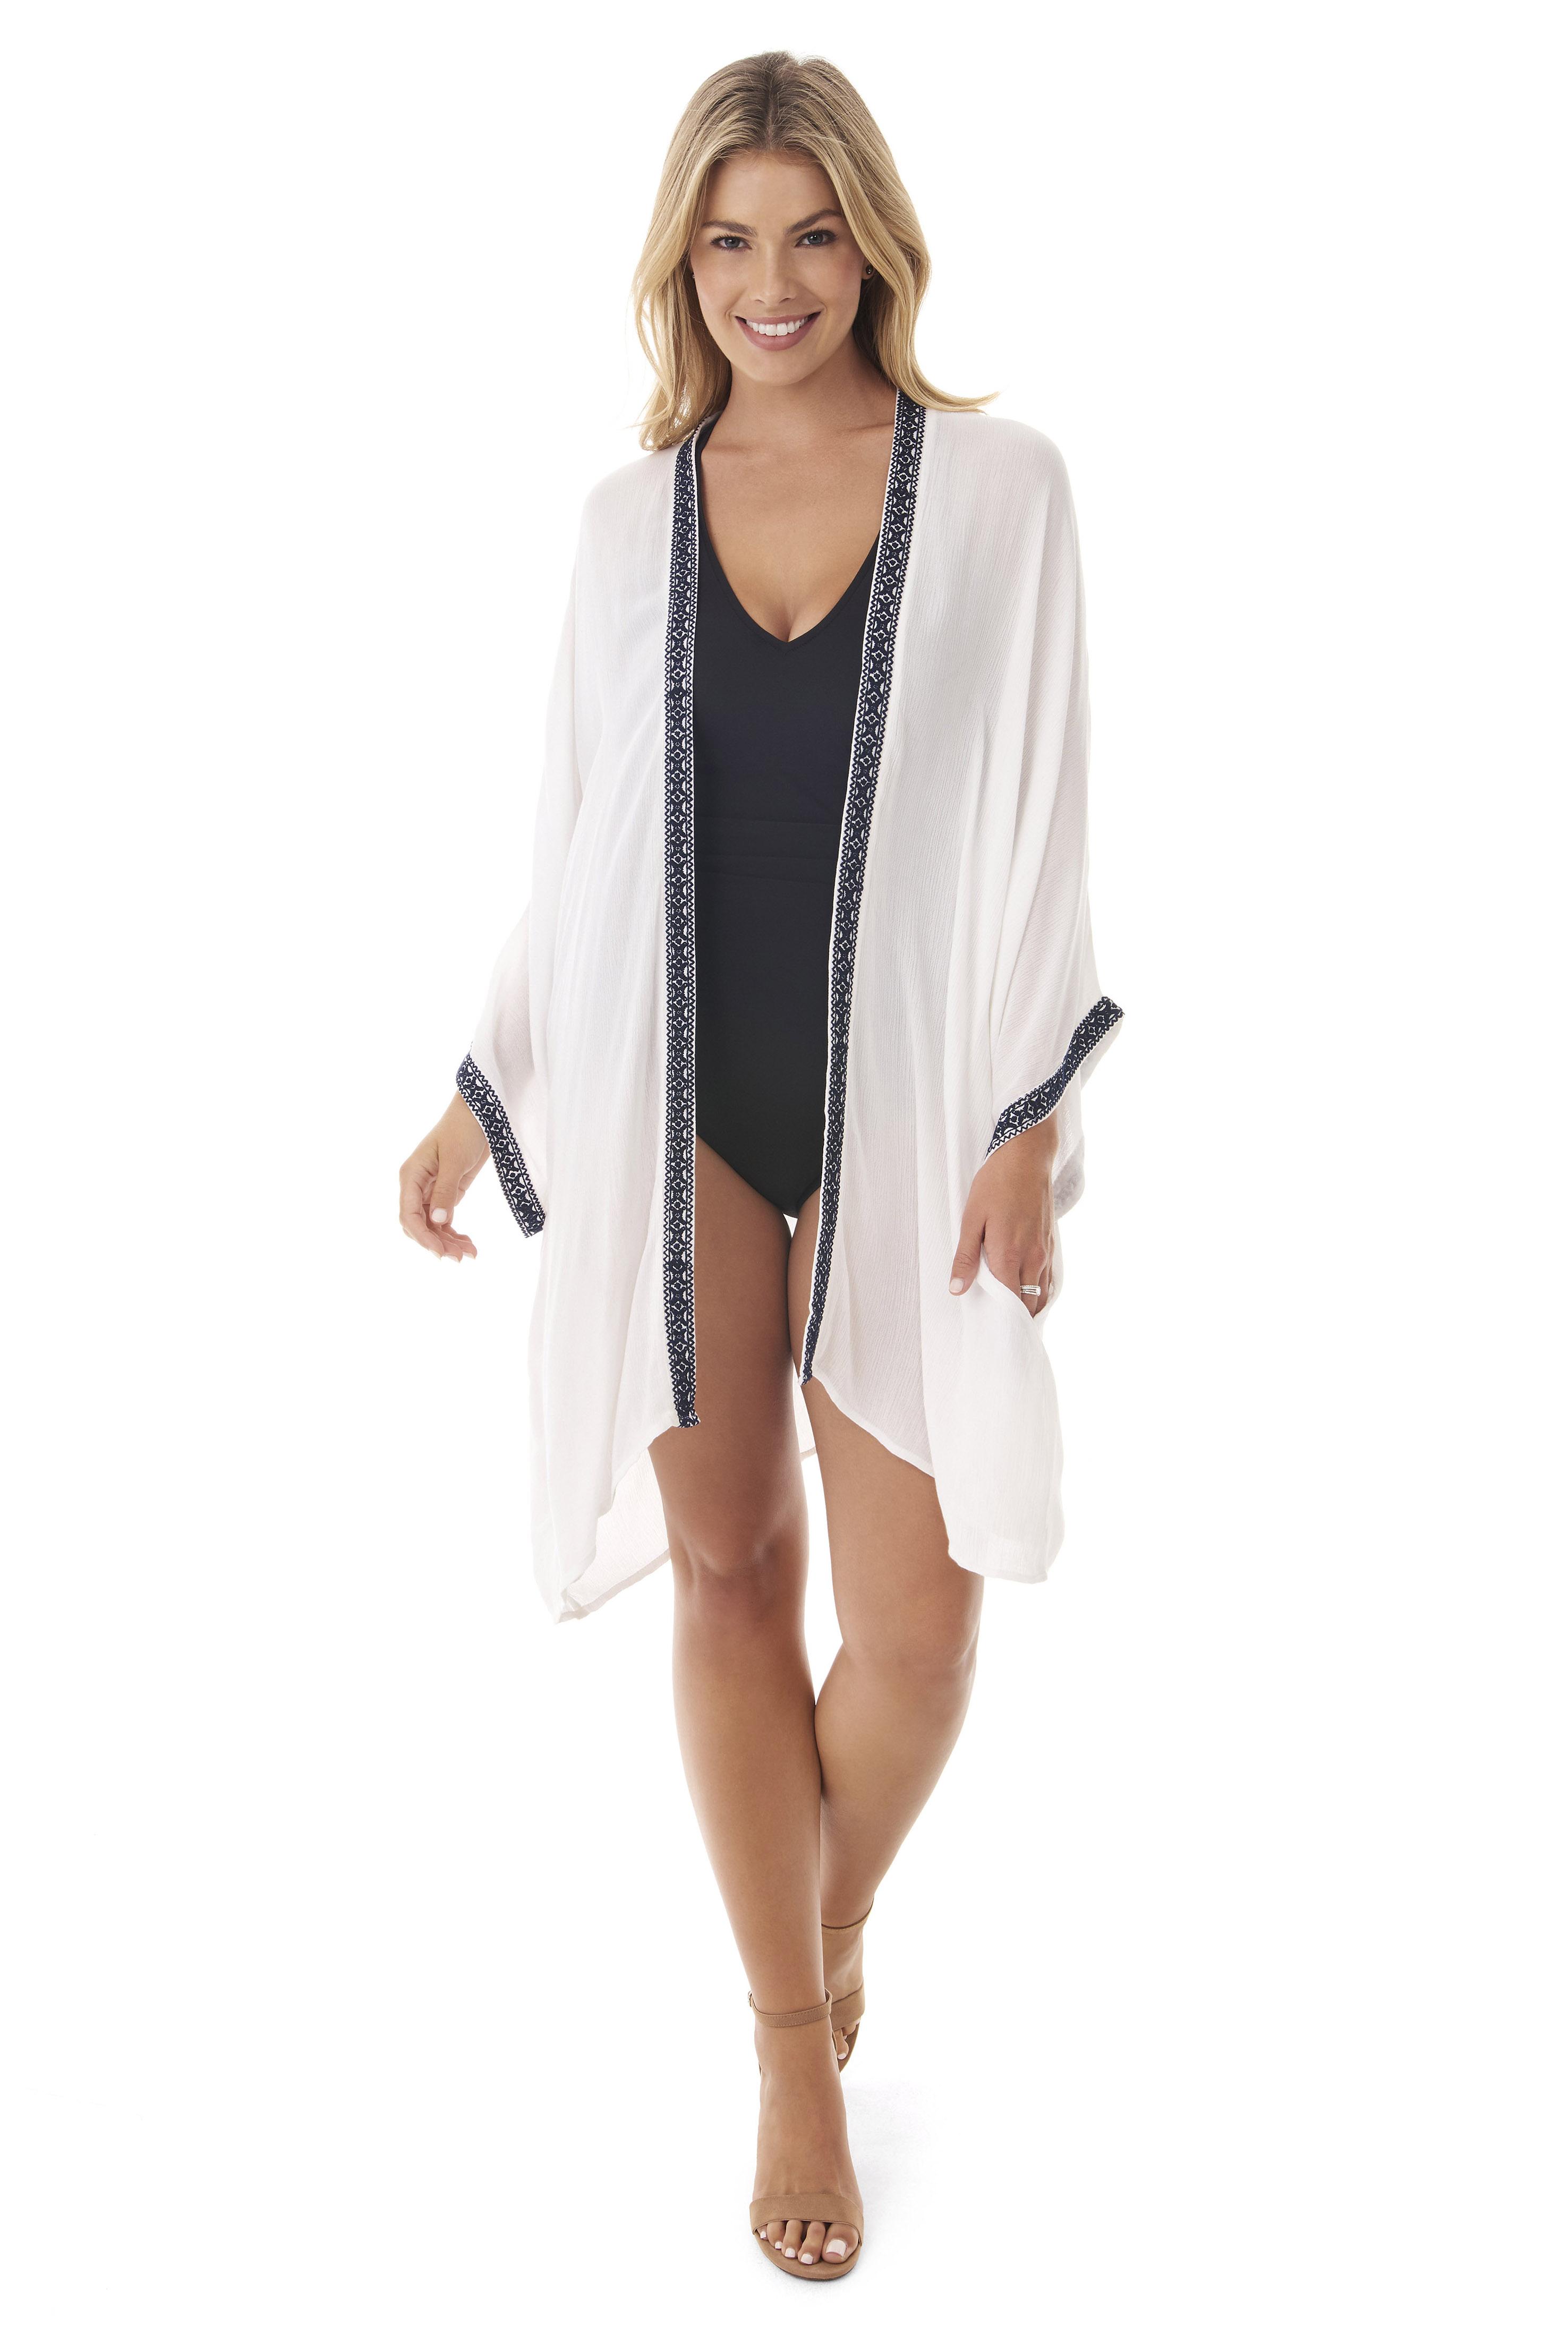 Penbrooke Kimono Swimsuit Cover-Up - White - Front